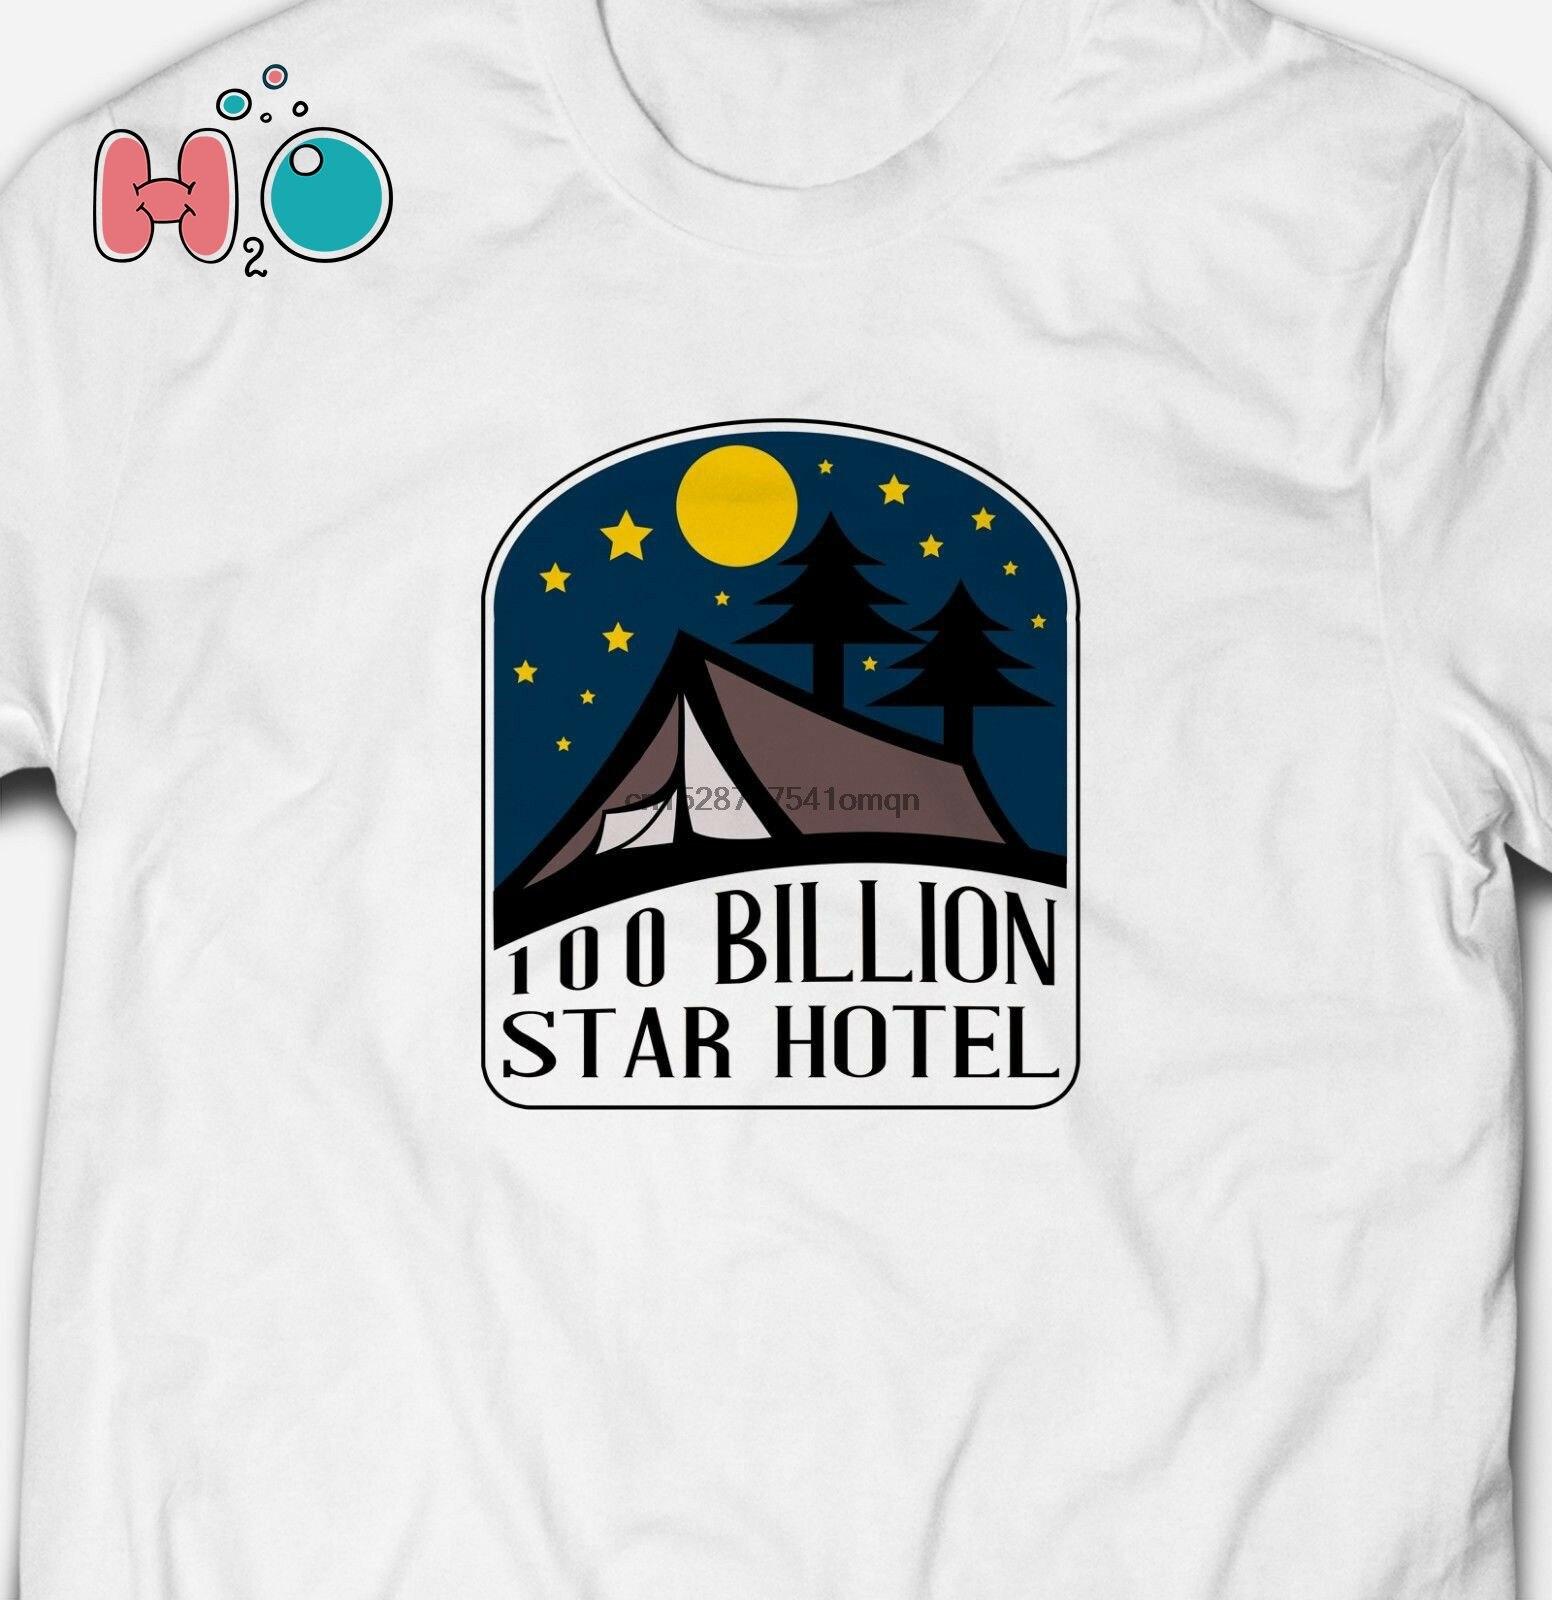 100 BILLION STAR HOTEL CAMPING HIKING ADVENTURE 100% Cotton Mens T-shirt Tee